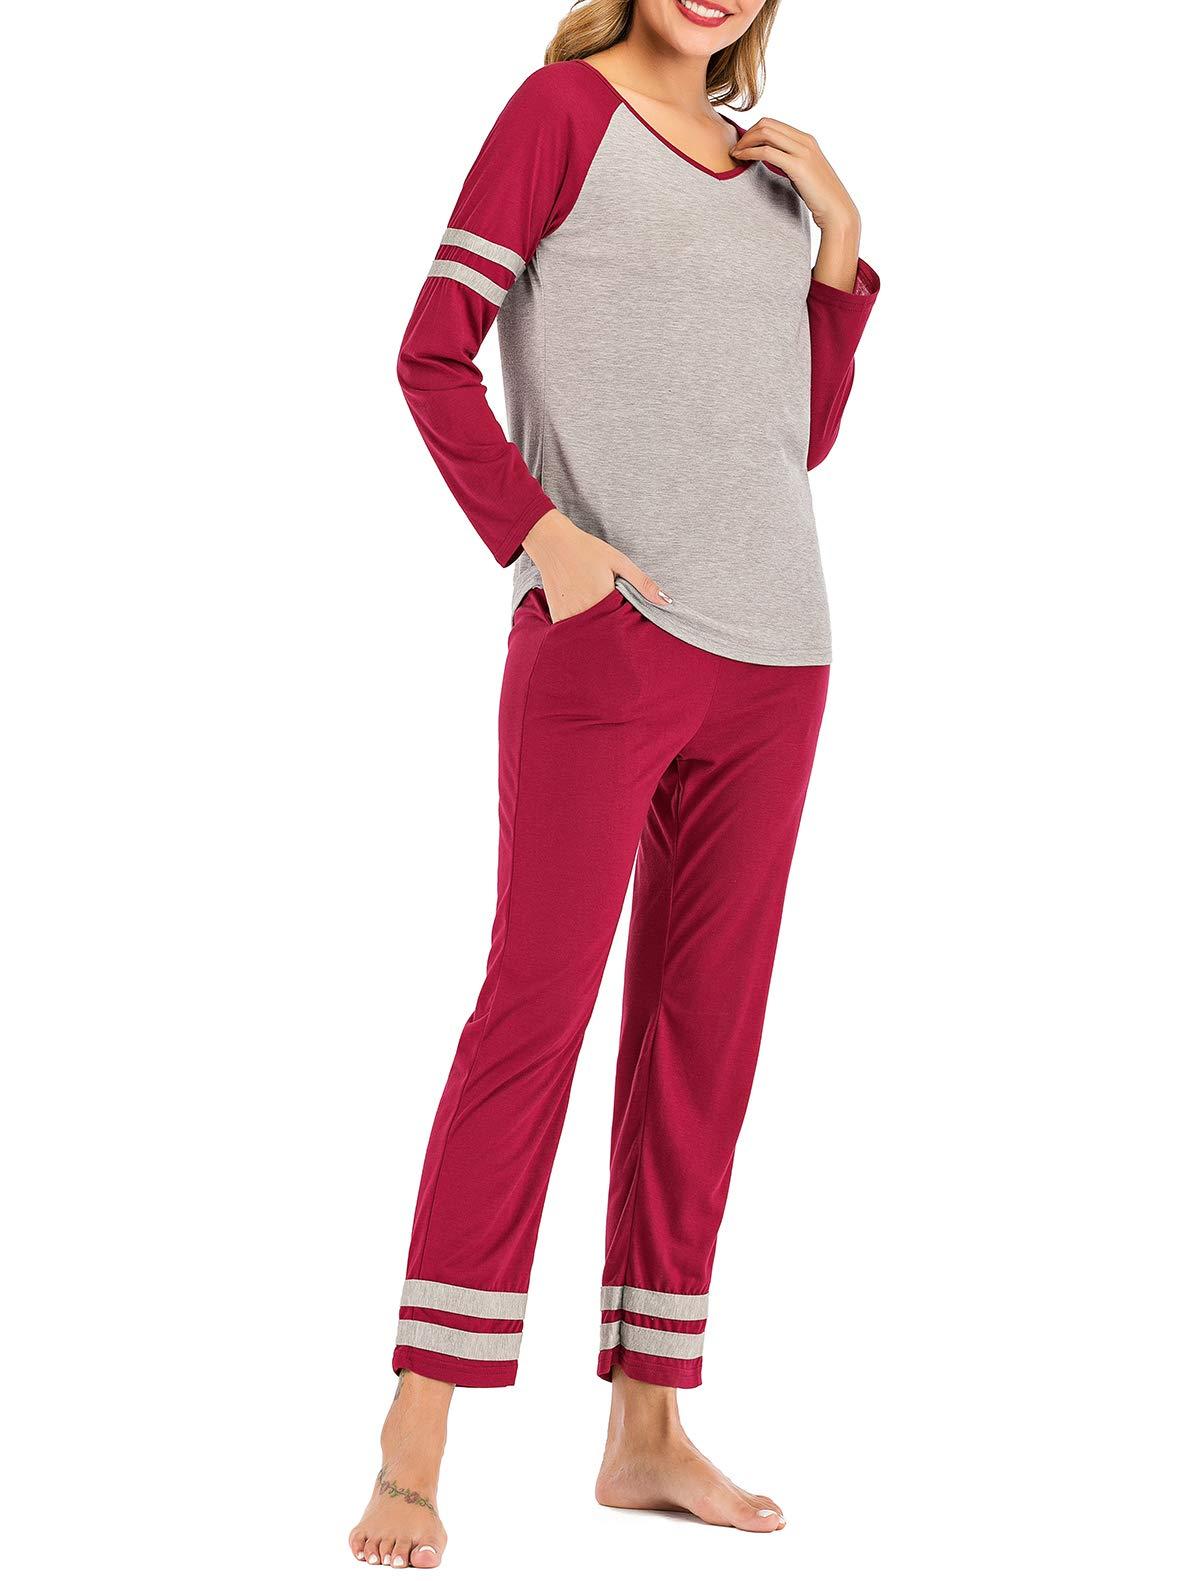 AOVXO Soft Pajama Set for Women Casual V-Neck Long Sleeve Loose Loungewear Set Long Sleeve Tops & Long Sleep Pants with Pockets Loungewear (Wine Red with Grey, XXL)